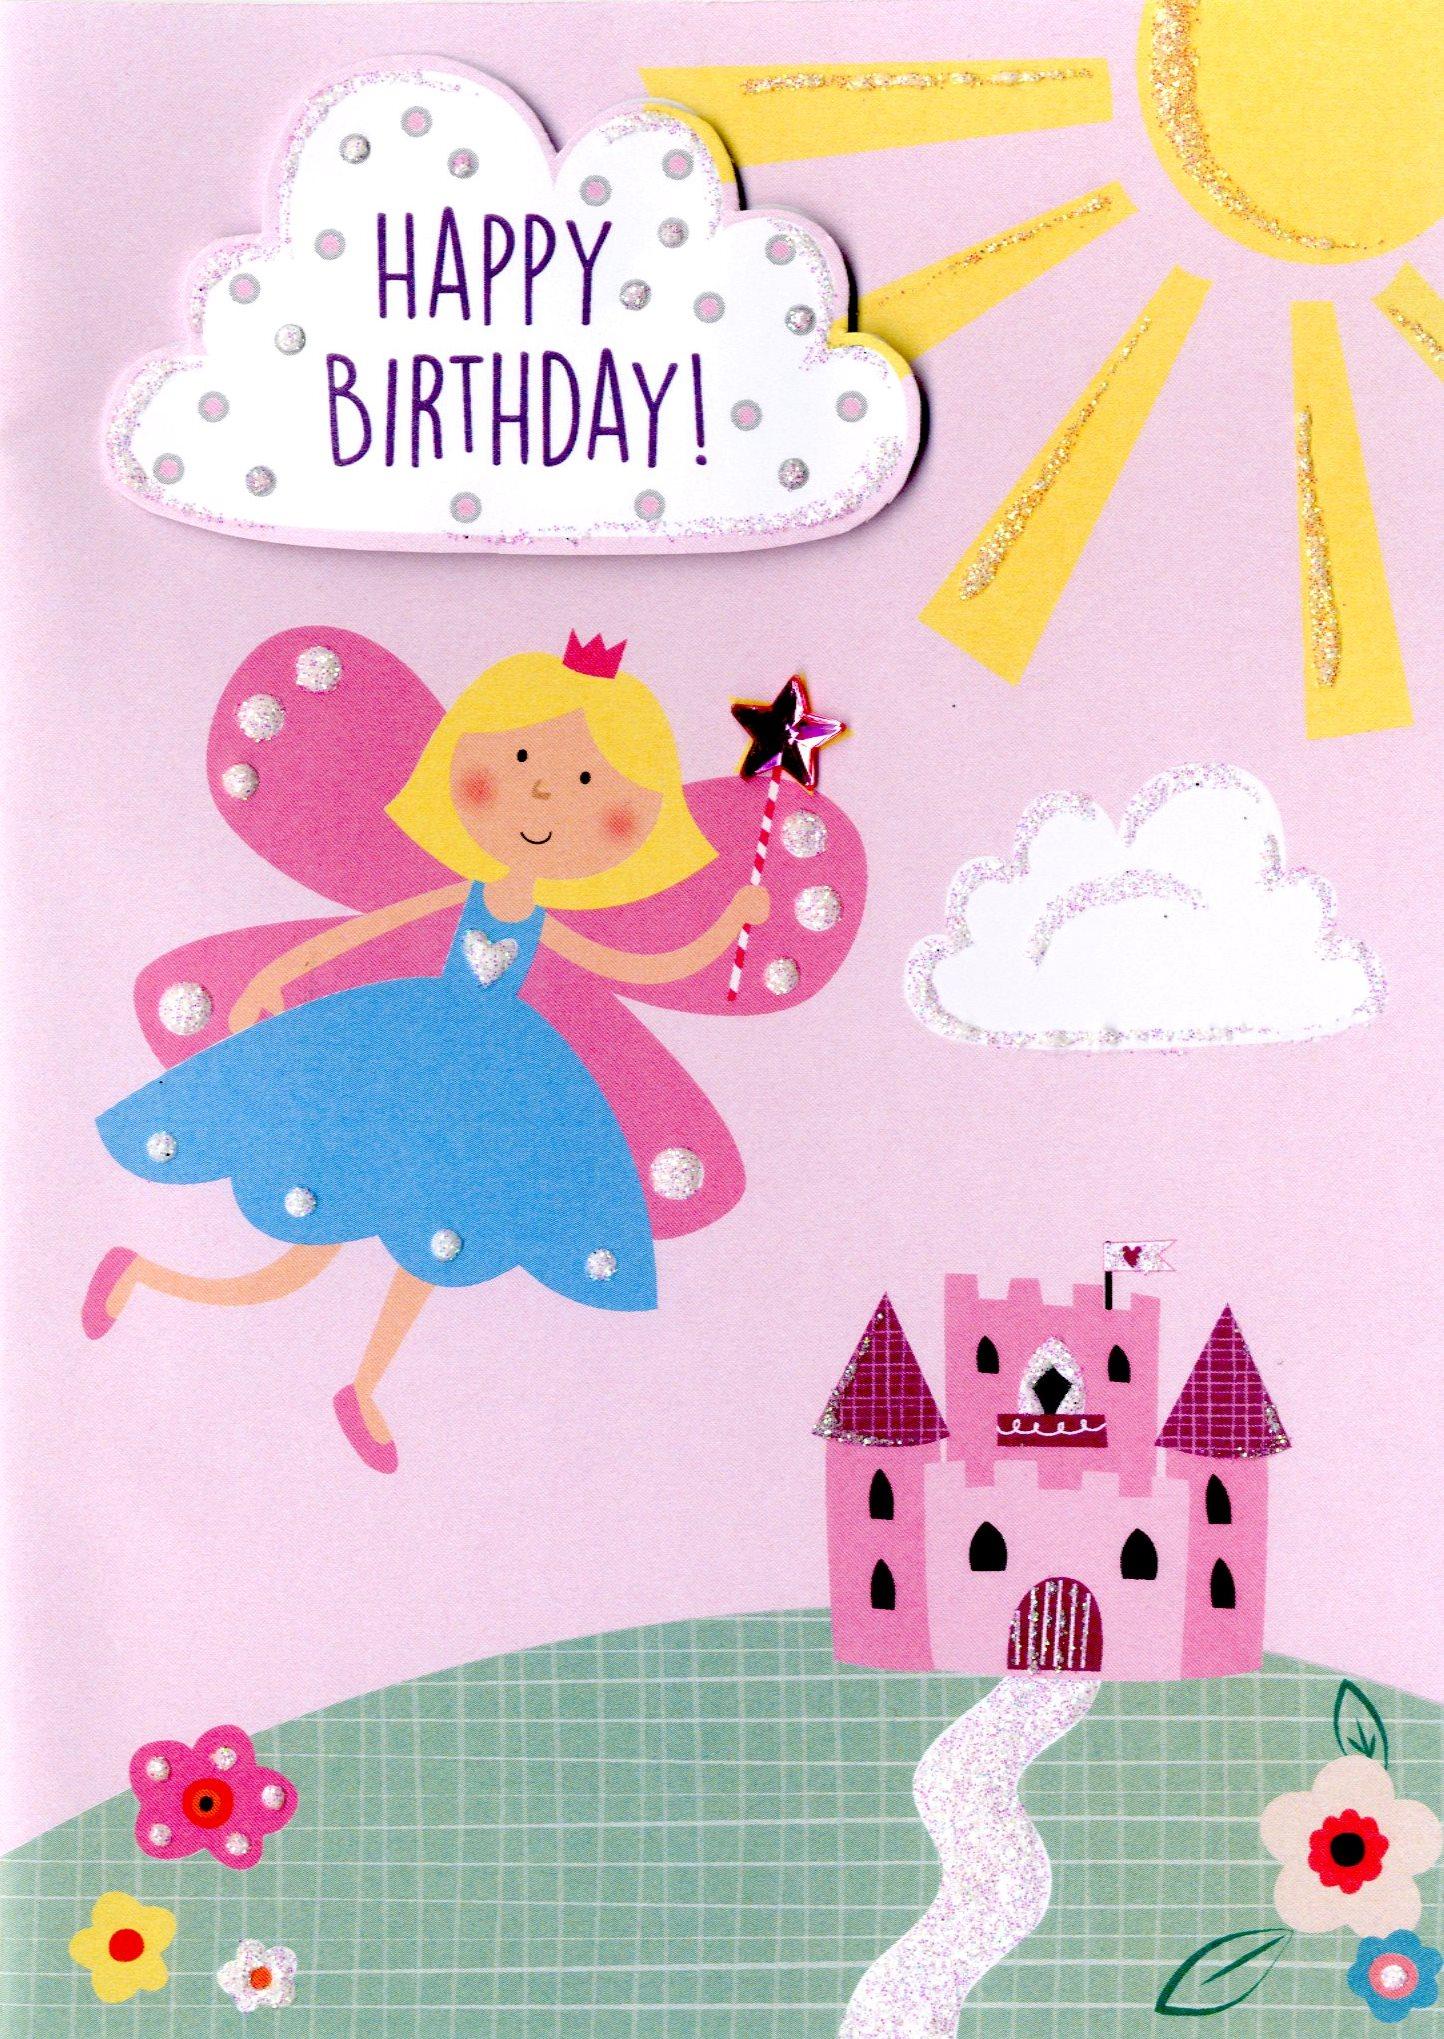 Happy birthday princess greeting card cards love kates happy birthday princess greeting card m4hsunfo